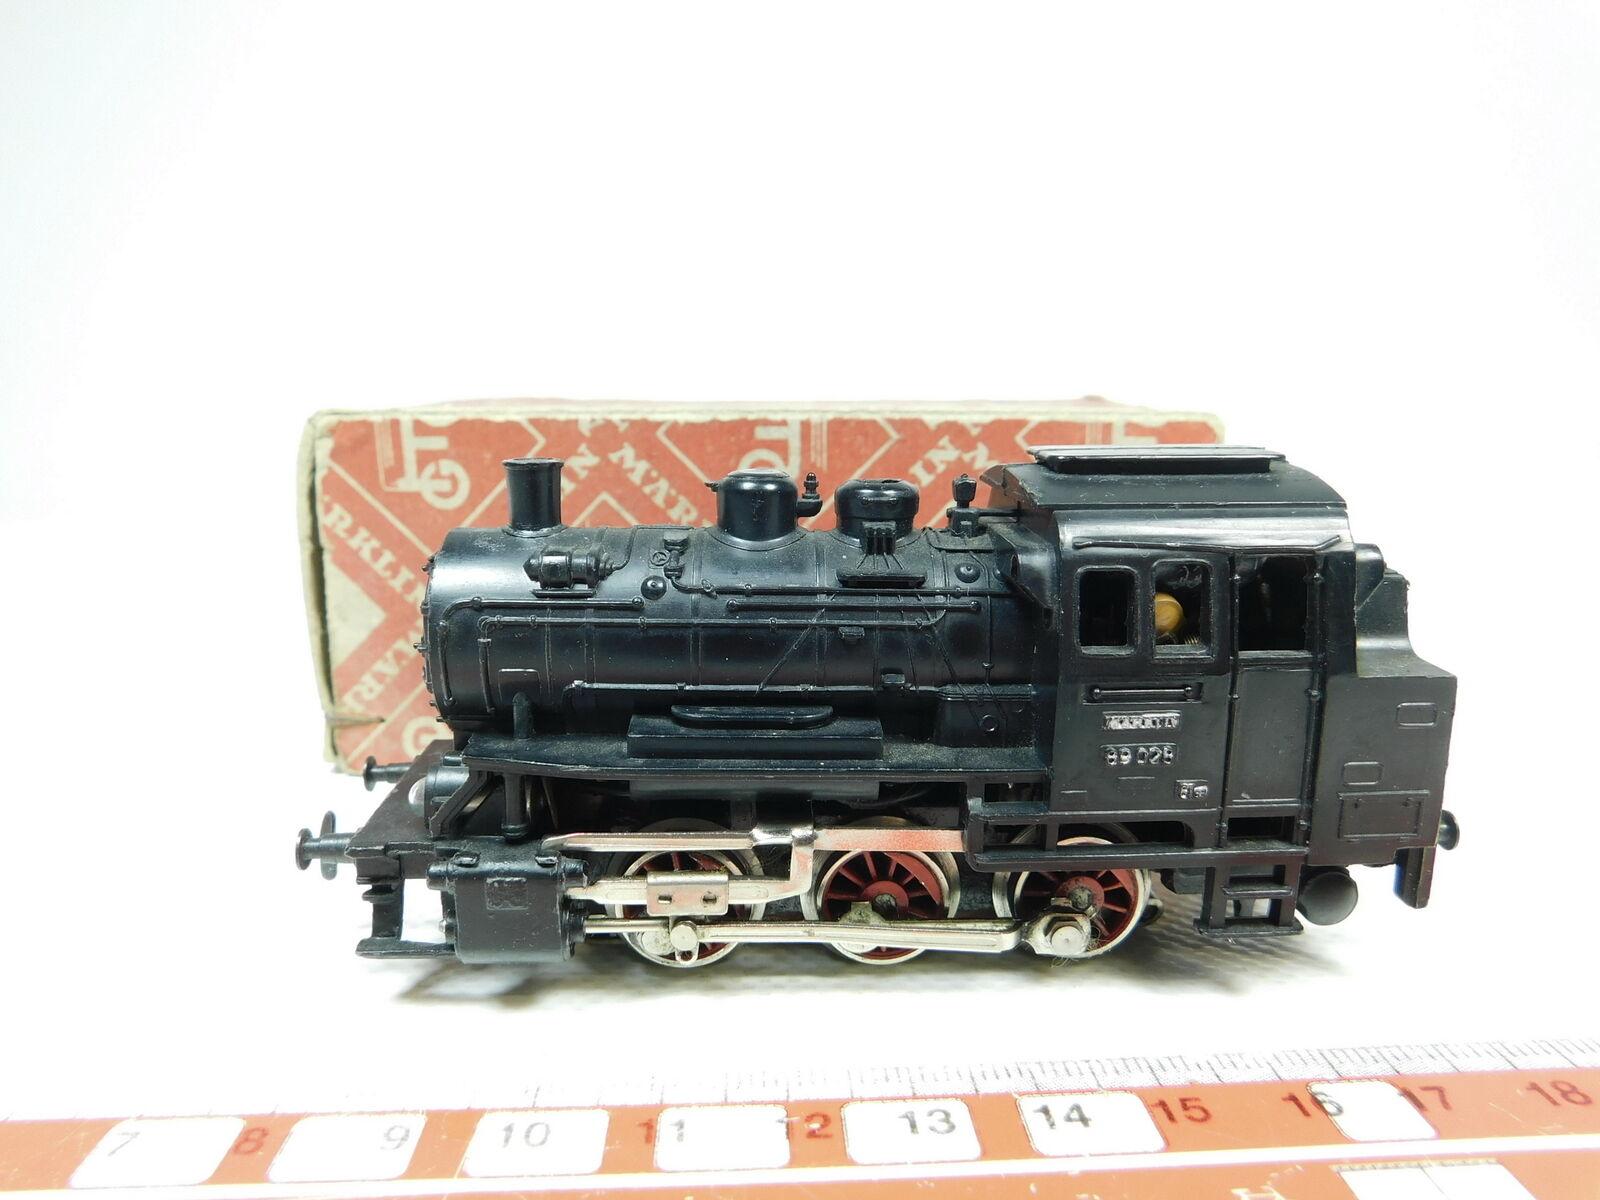 Bh117-0,5     H0/AC 3000 LOCOMOTIVA TENDER/Locomotiva a vapore 89 028 / cm